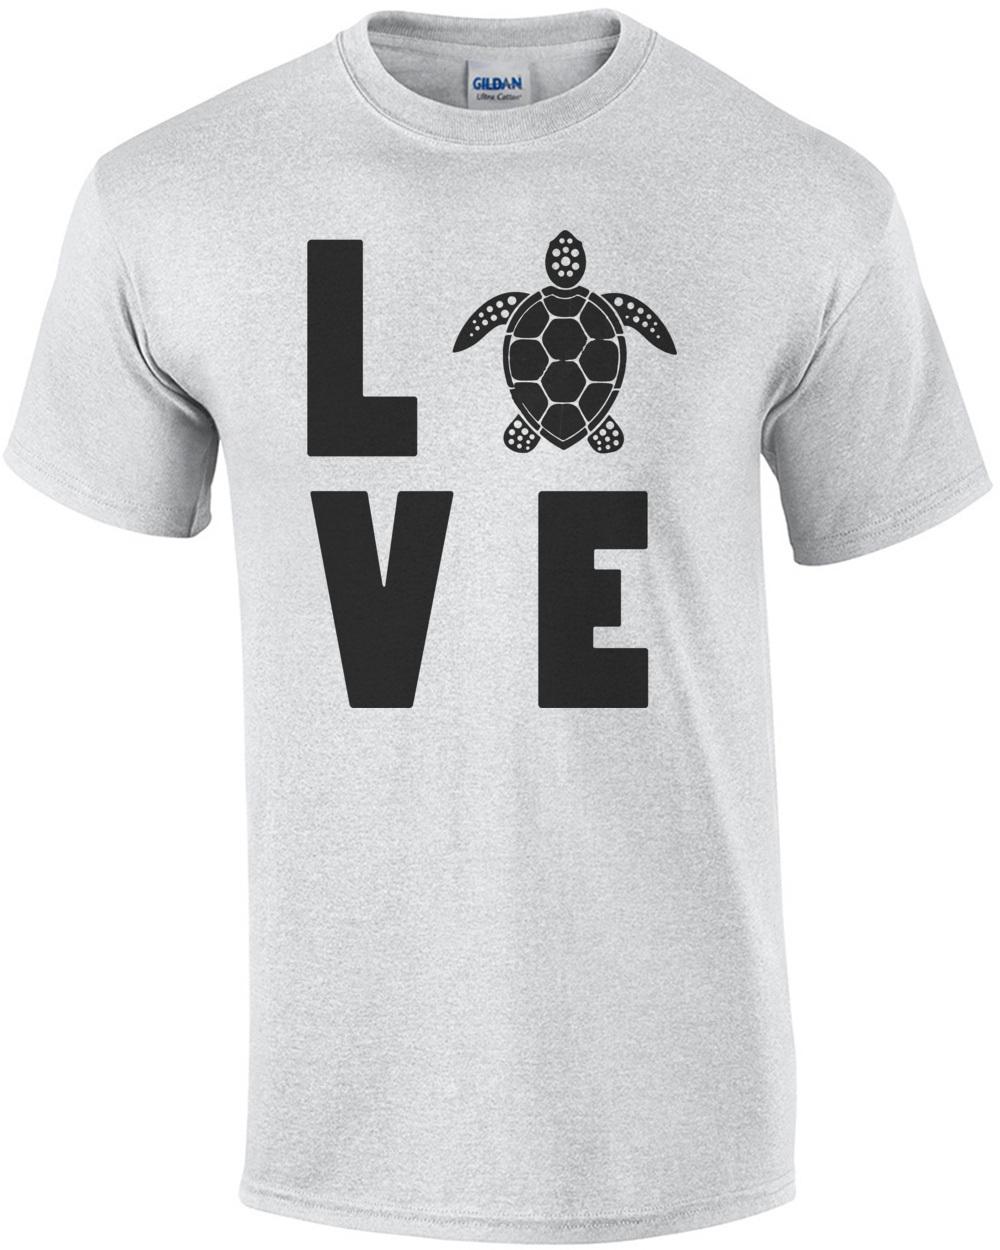 fef8c7c4b3d51 love-turtle--turtle-tshirt-mens-regular-ash.jpg